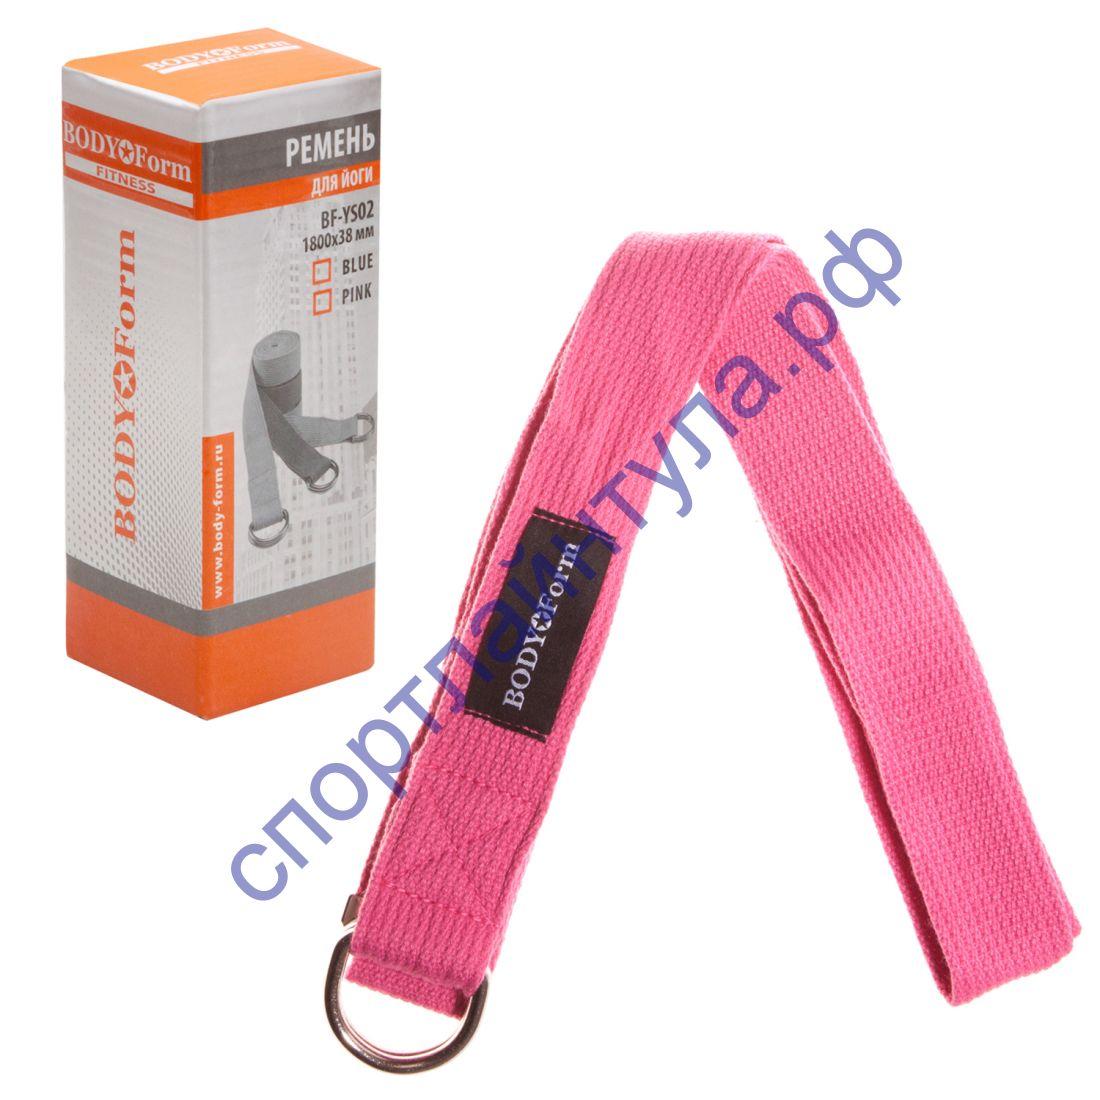 Ремень для йоги BF-YS02 pink